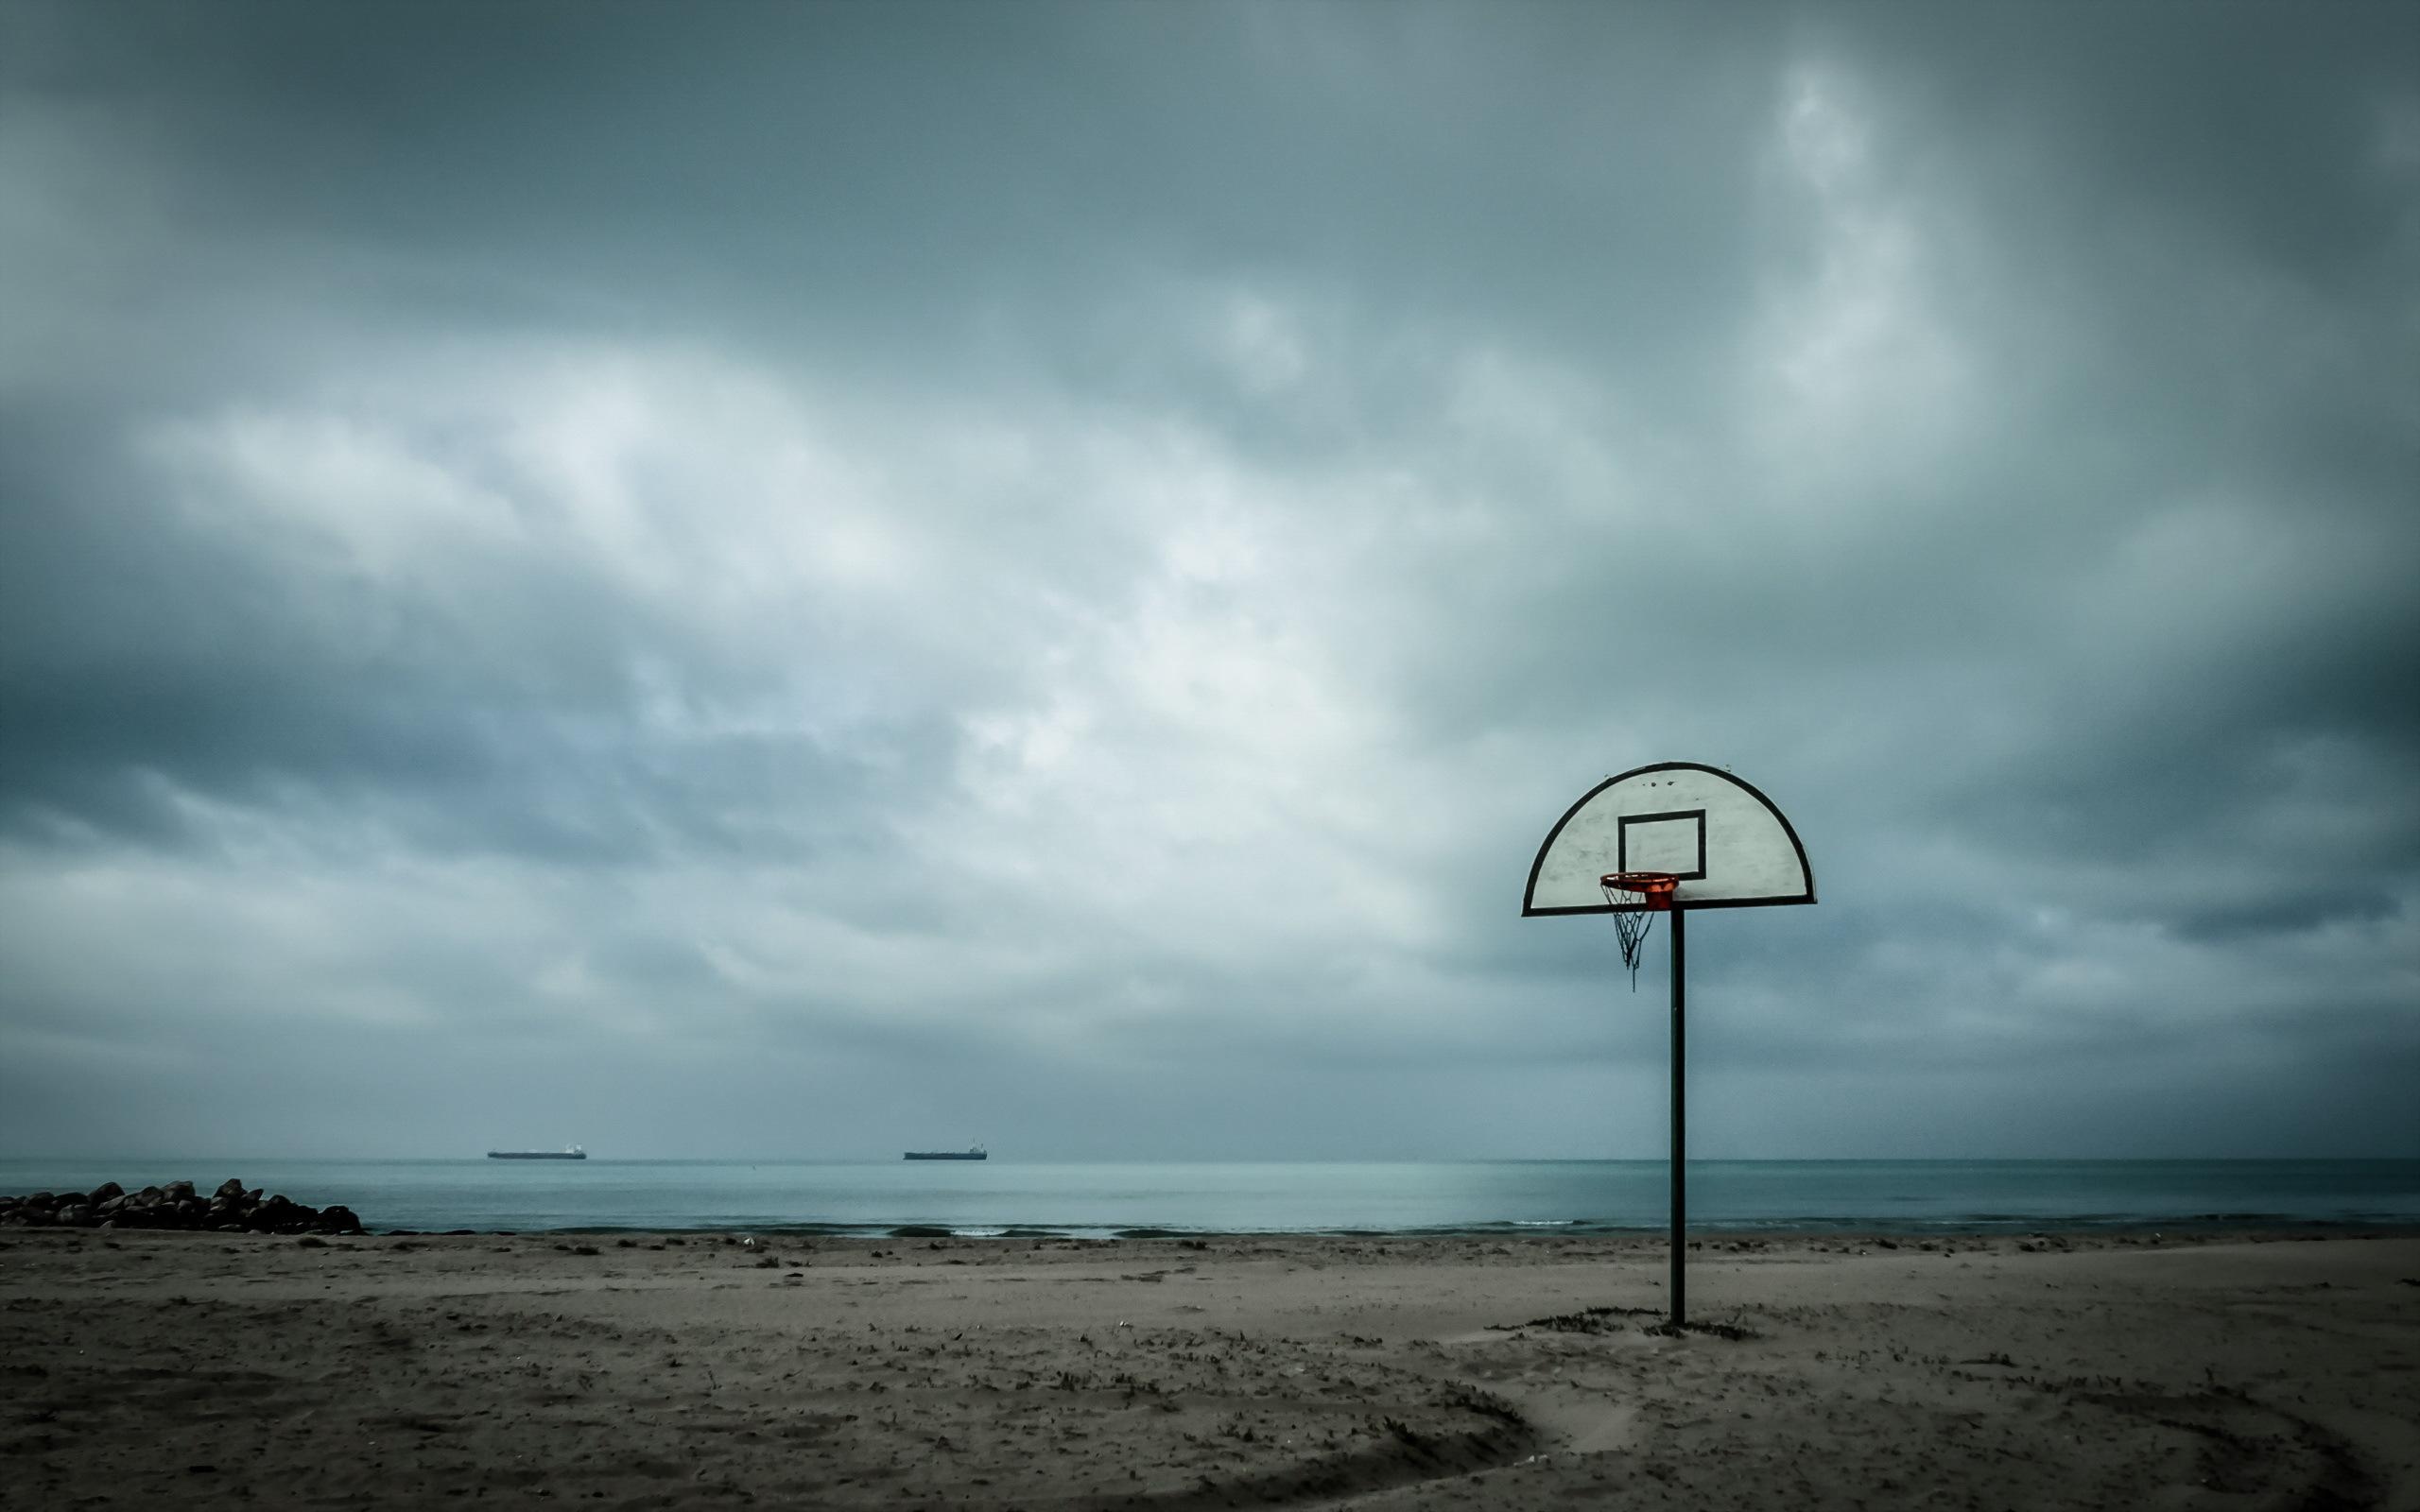 Fondo Con Iconos De Deporte: Baloncesto Fondos De Pantalla, Fondos De Escritorio